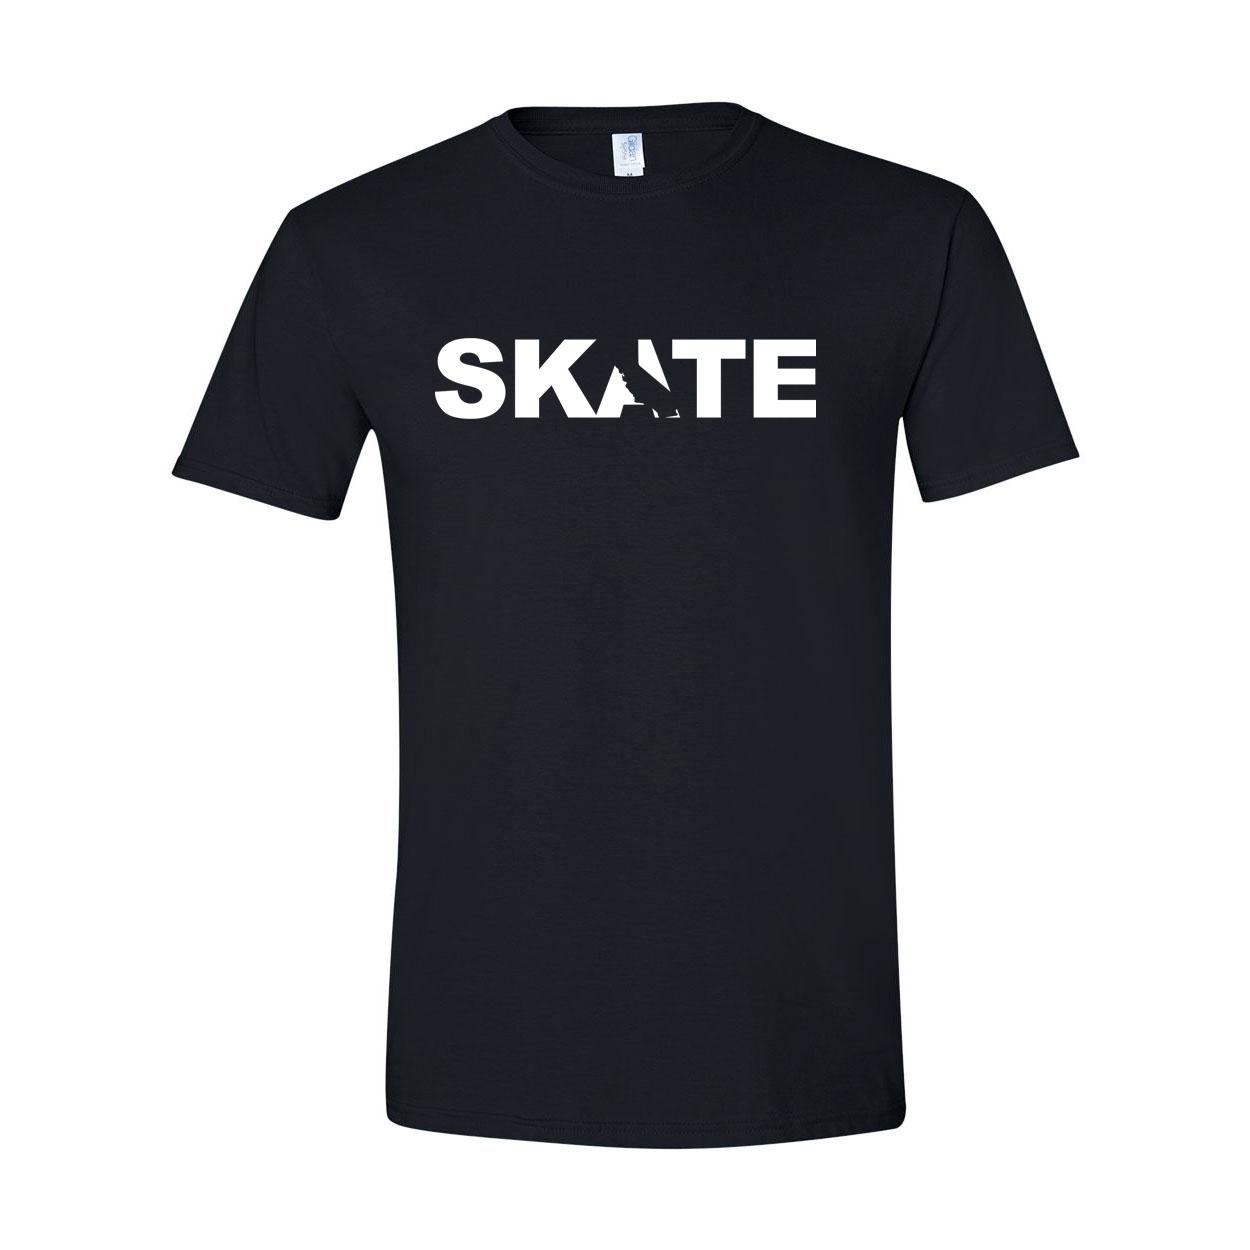 Skate California Classic T-Shirt Black (White Logo)